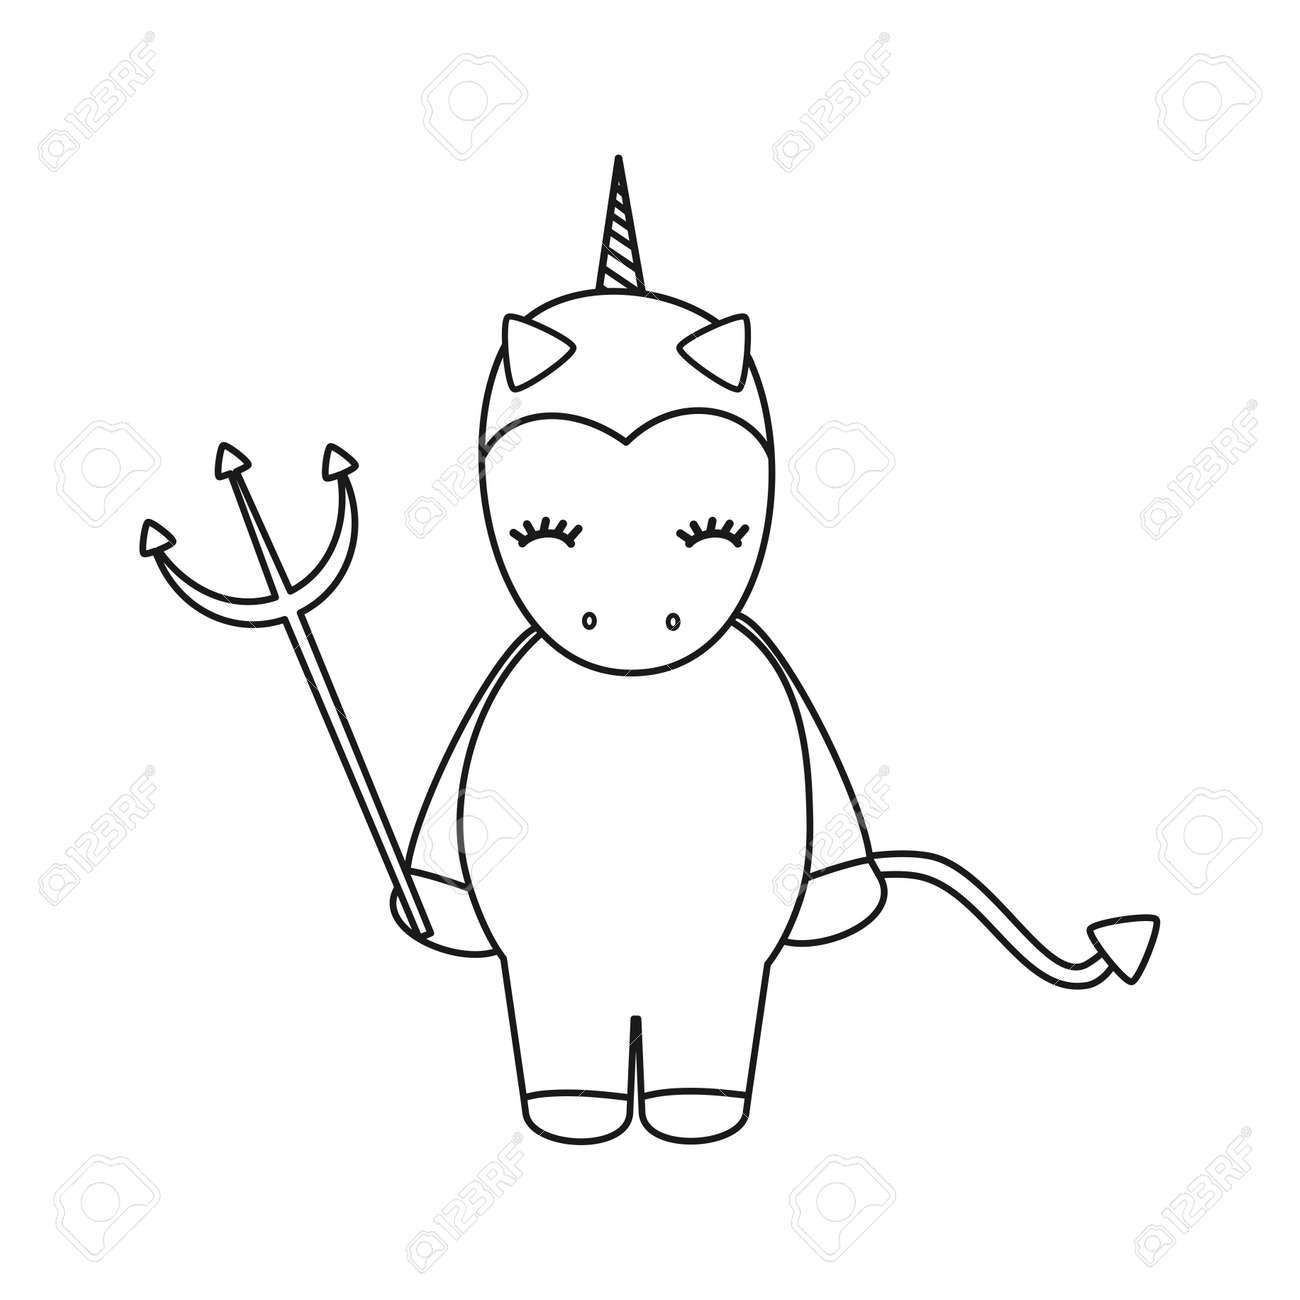 Cute Cartoon Black And White Devil Unicorn Halloween Vector Illustration